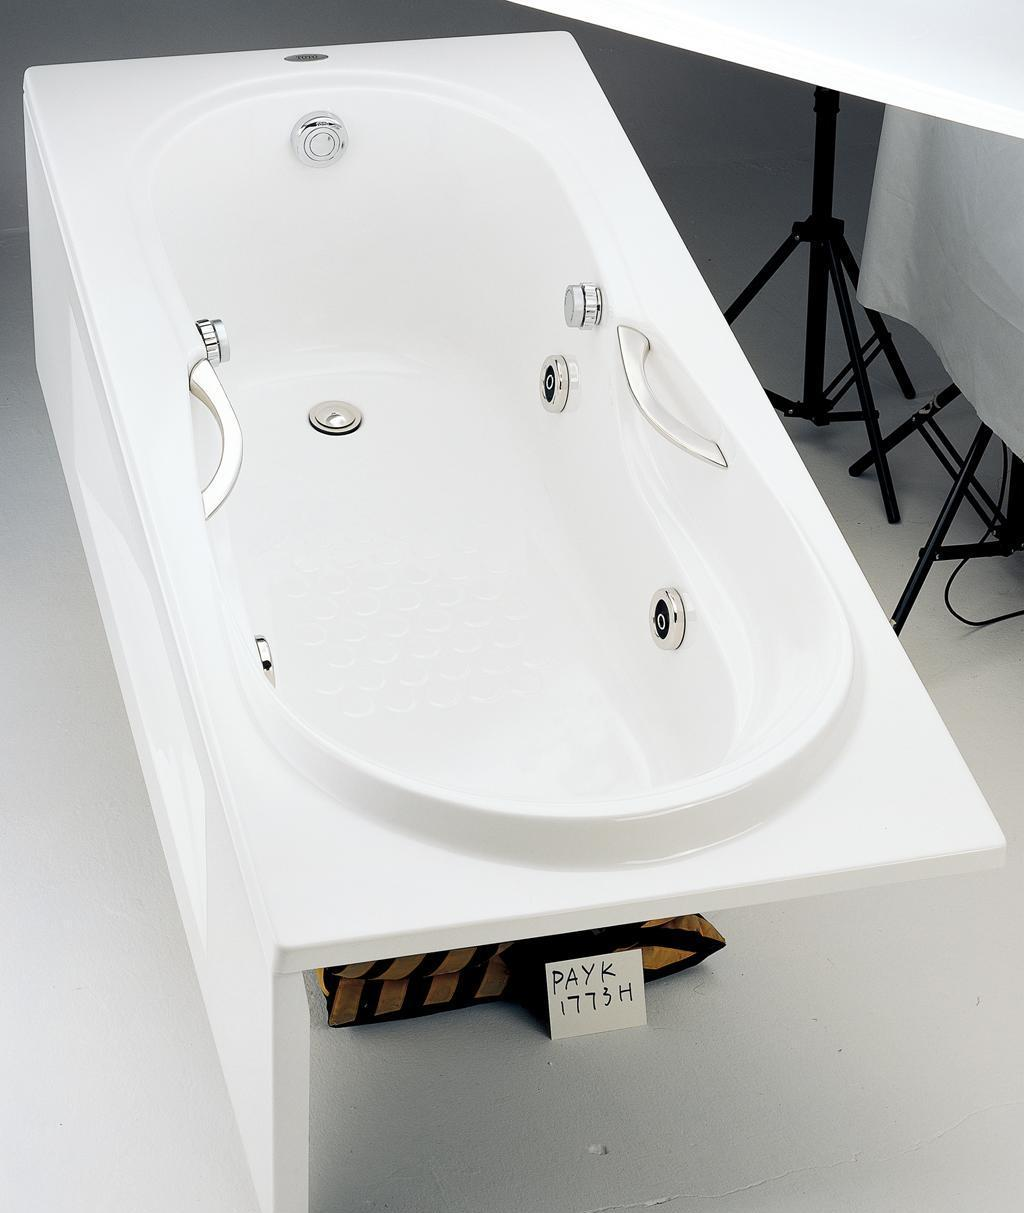 TOTO亚克力浴缸PAYK1773PAYK1773